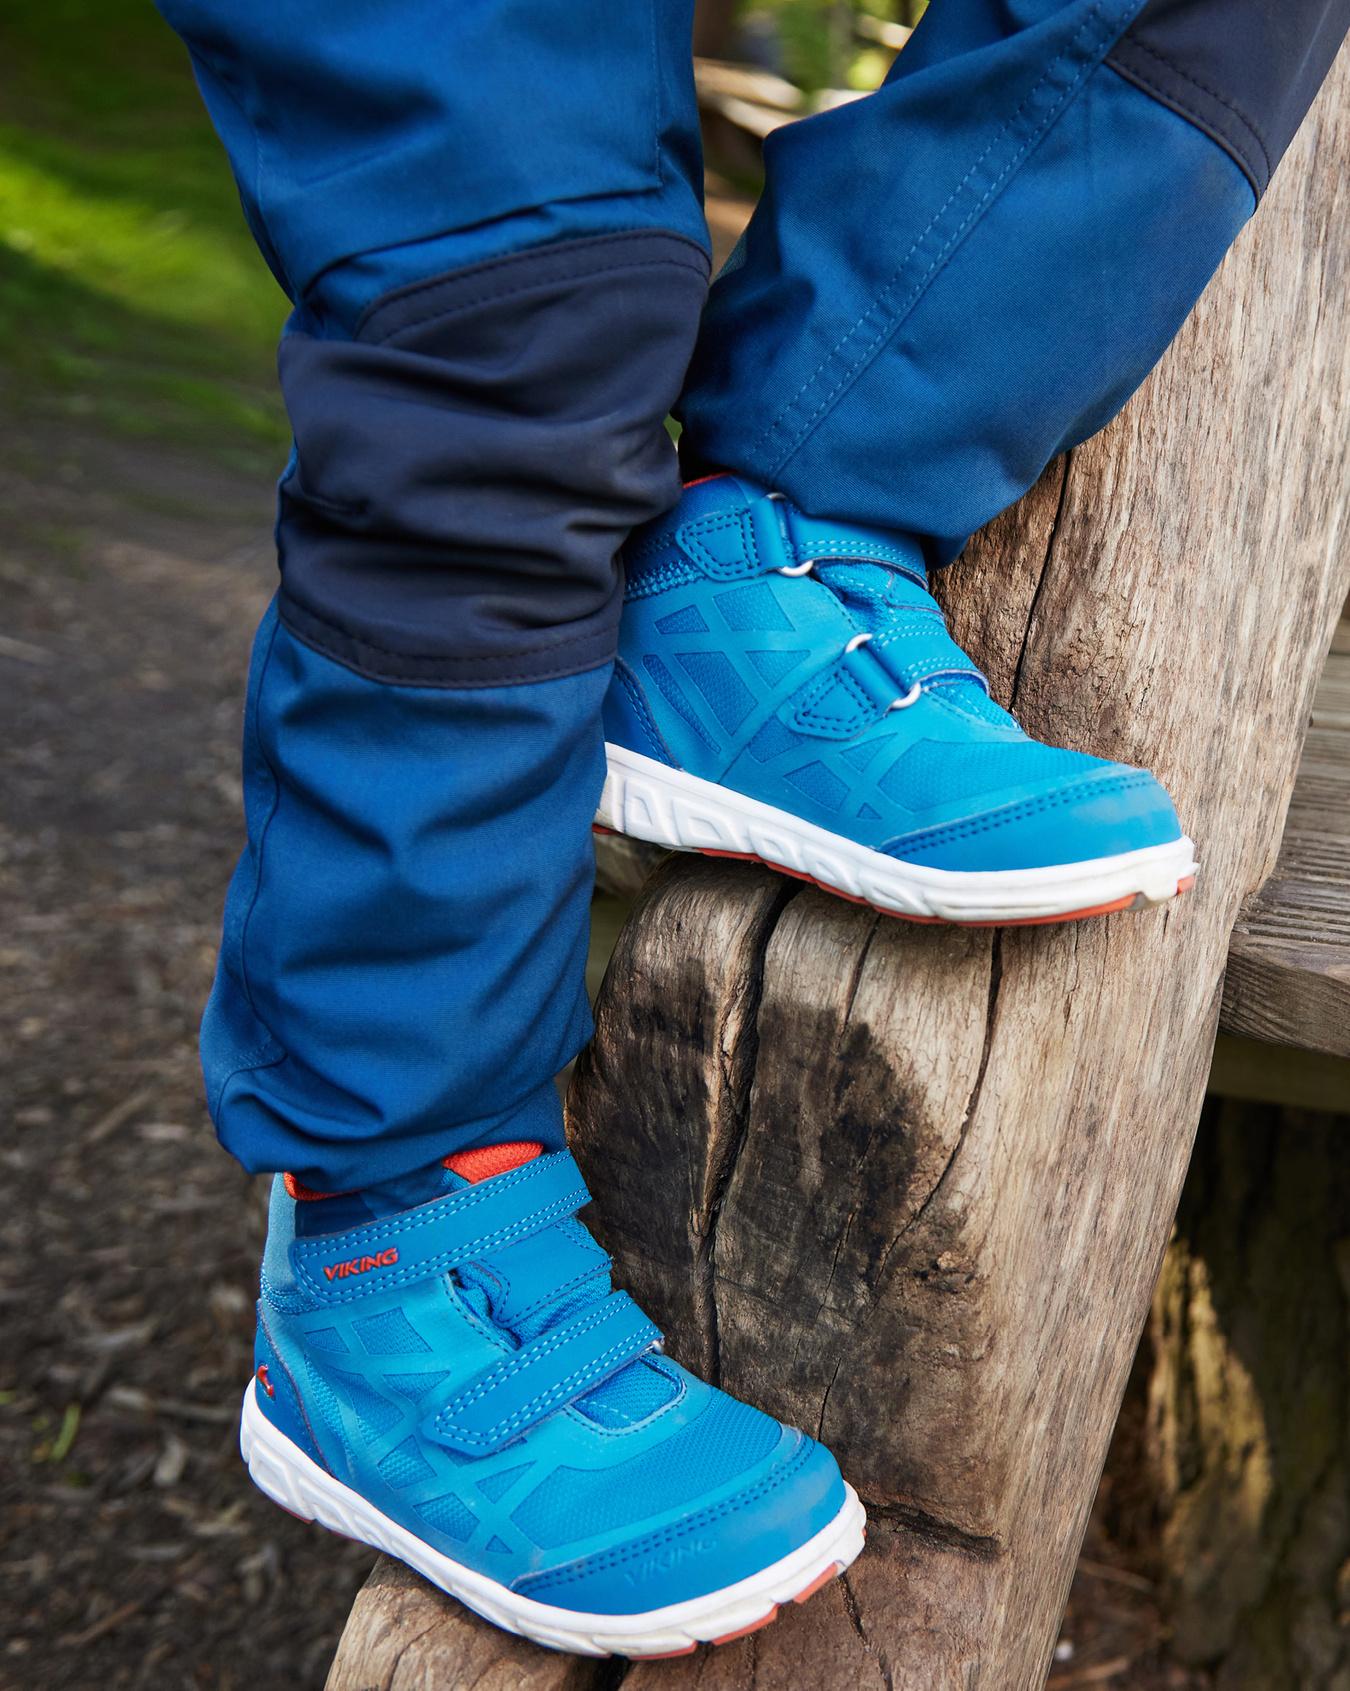 Veme Mid R GTX Royal Blue Sneaker